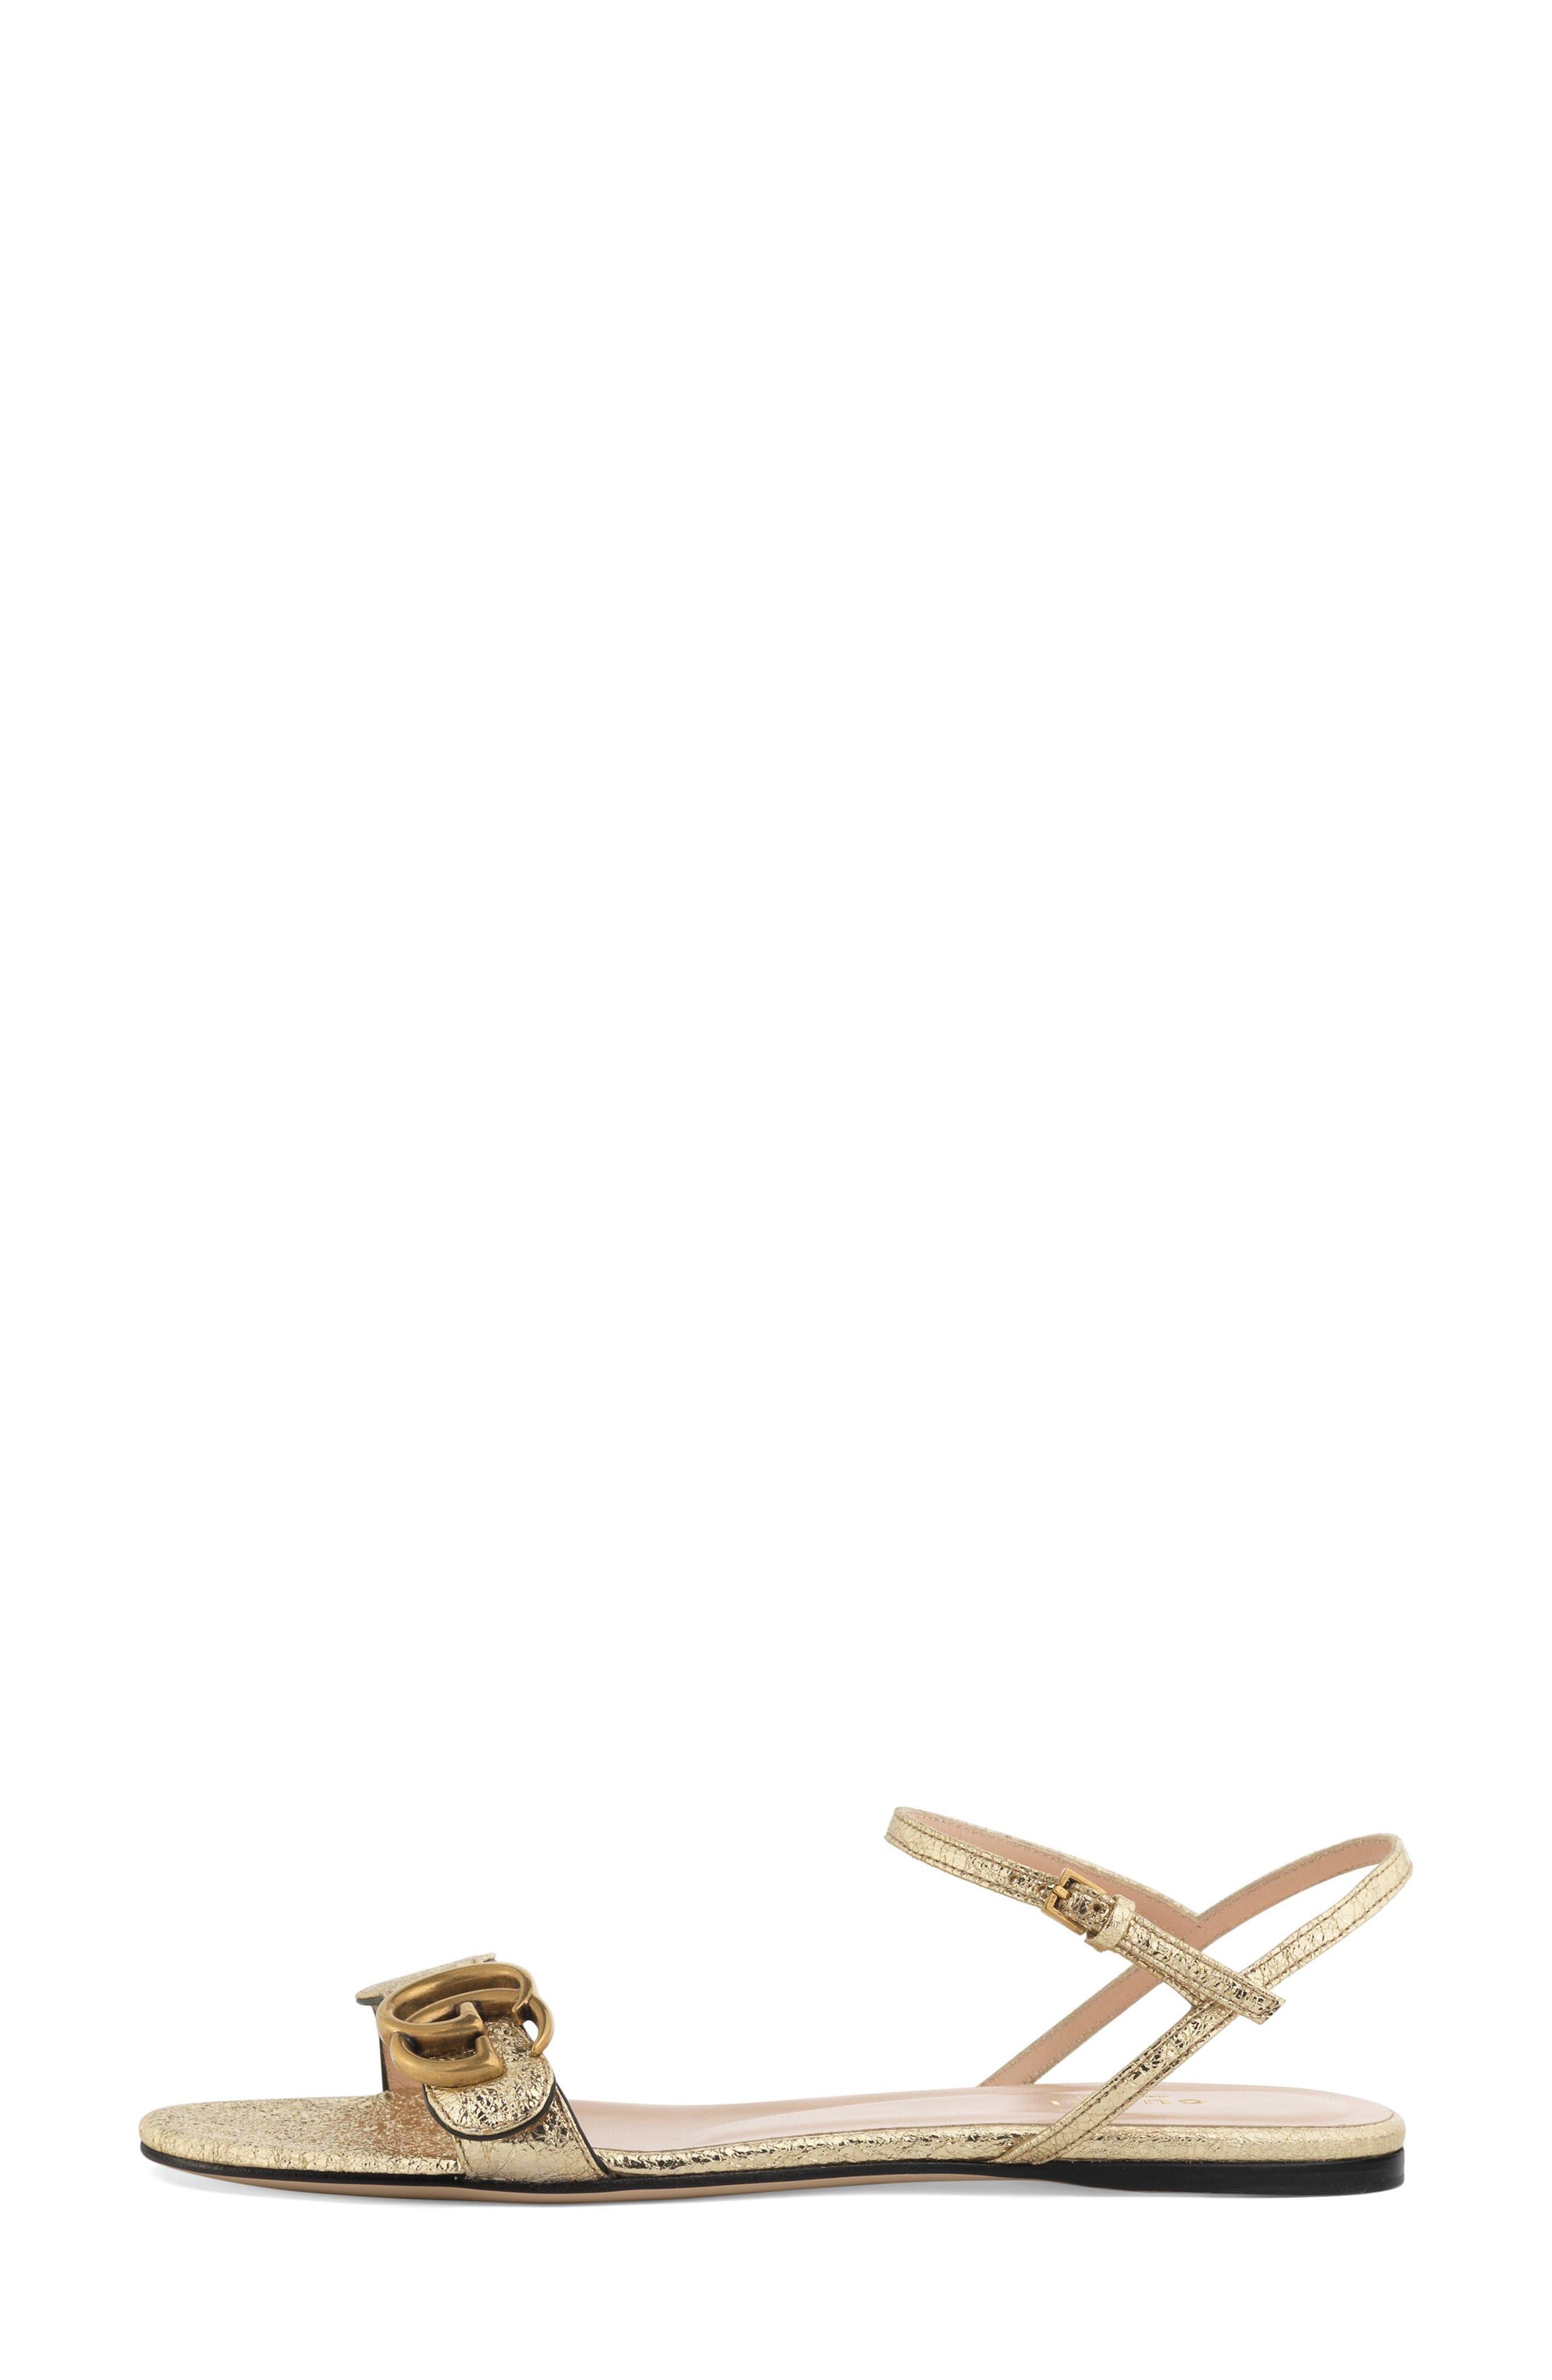 GUCCI, Marmont Quarter Strap Flat Sandal, Alternate thumbnail 2, color, PLATINO